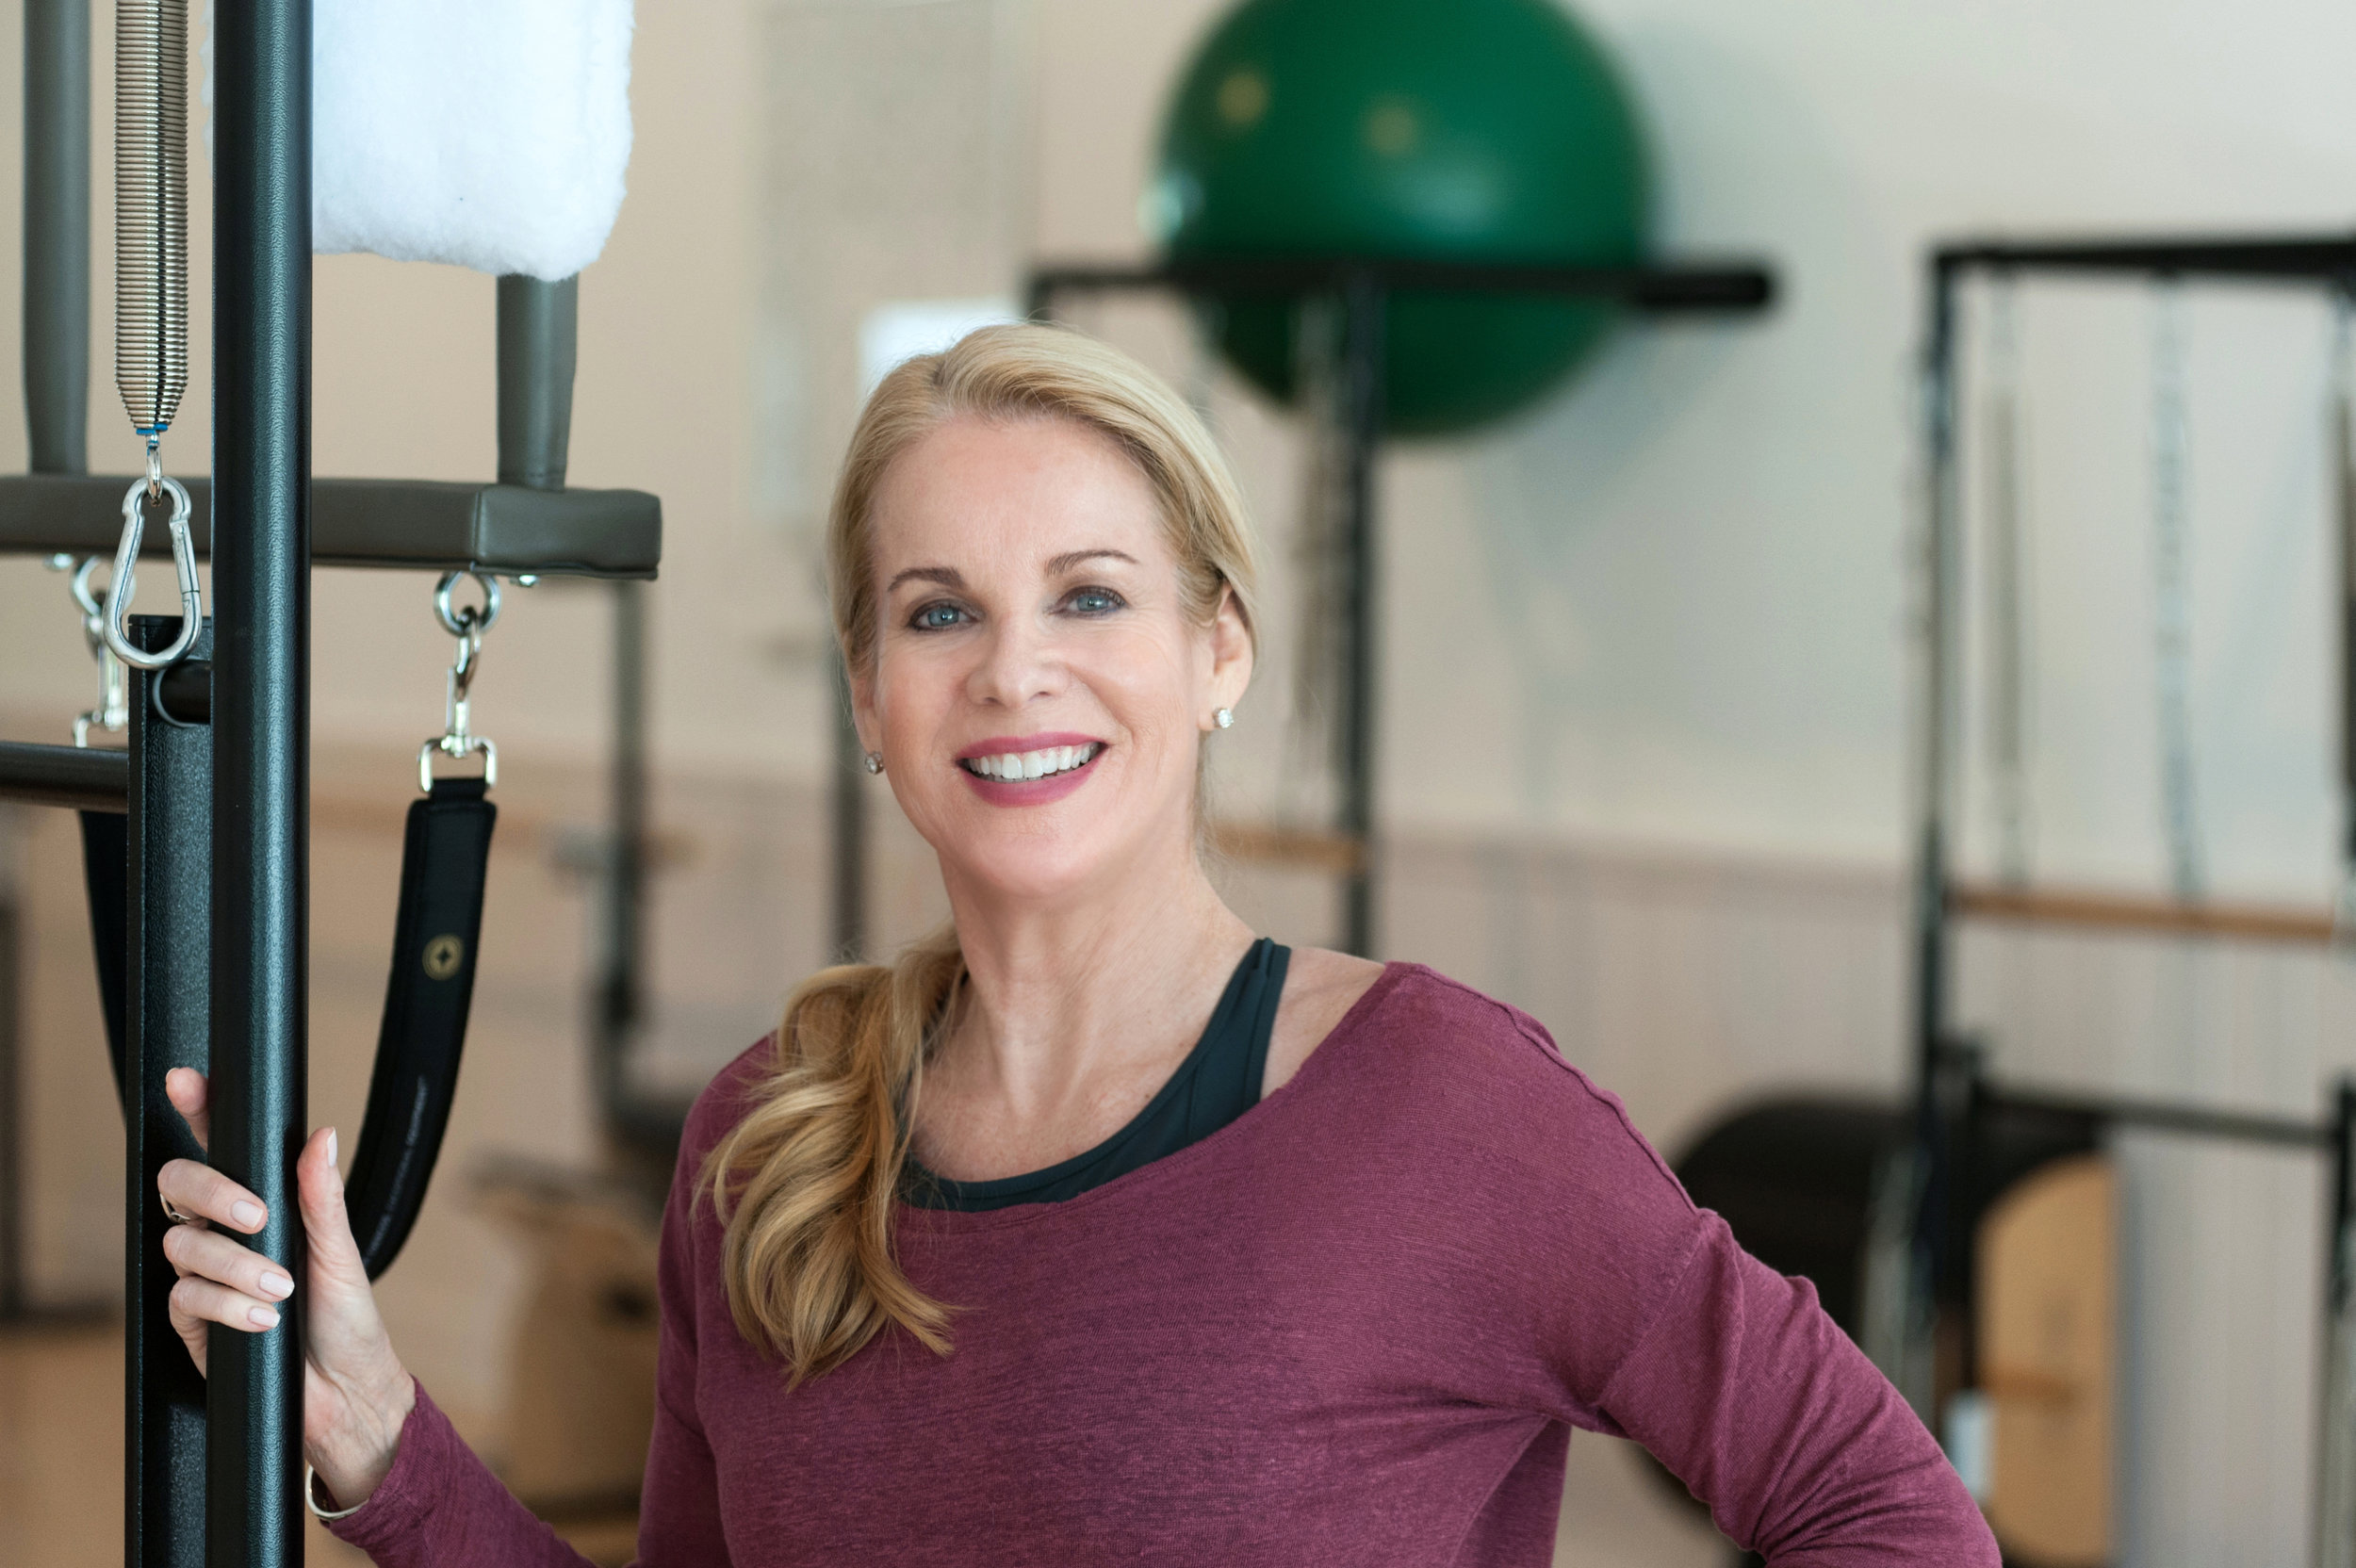 Nina Desloge-Day, a STOTT PILATES® Certified Instructor. Owner of the Pilates Works of Sarasota studio, located in Sarasota, FL.